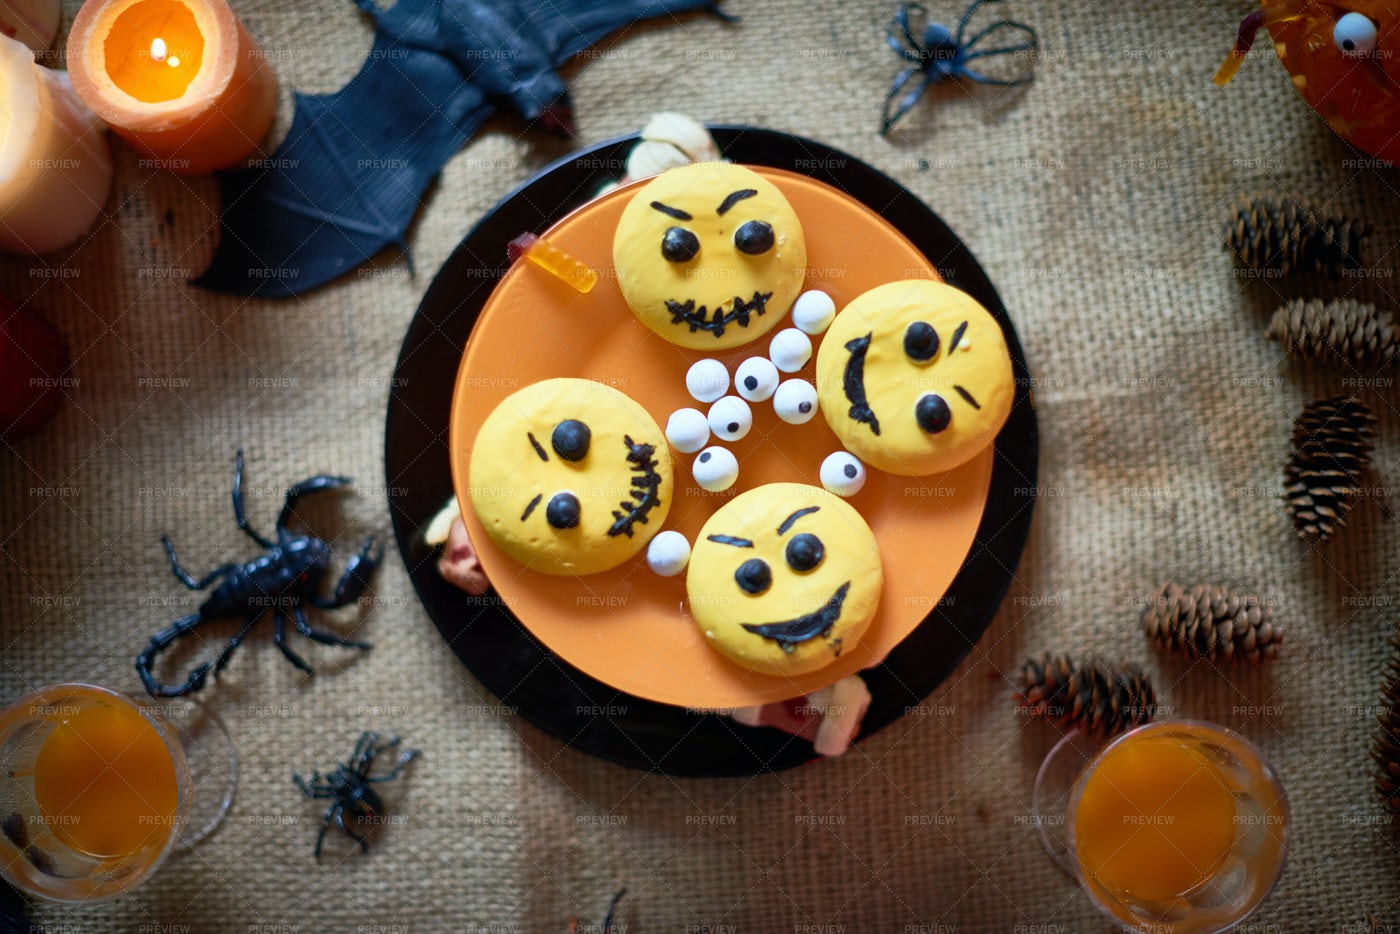 Halloween Cake With Emoticons: Stock Photos